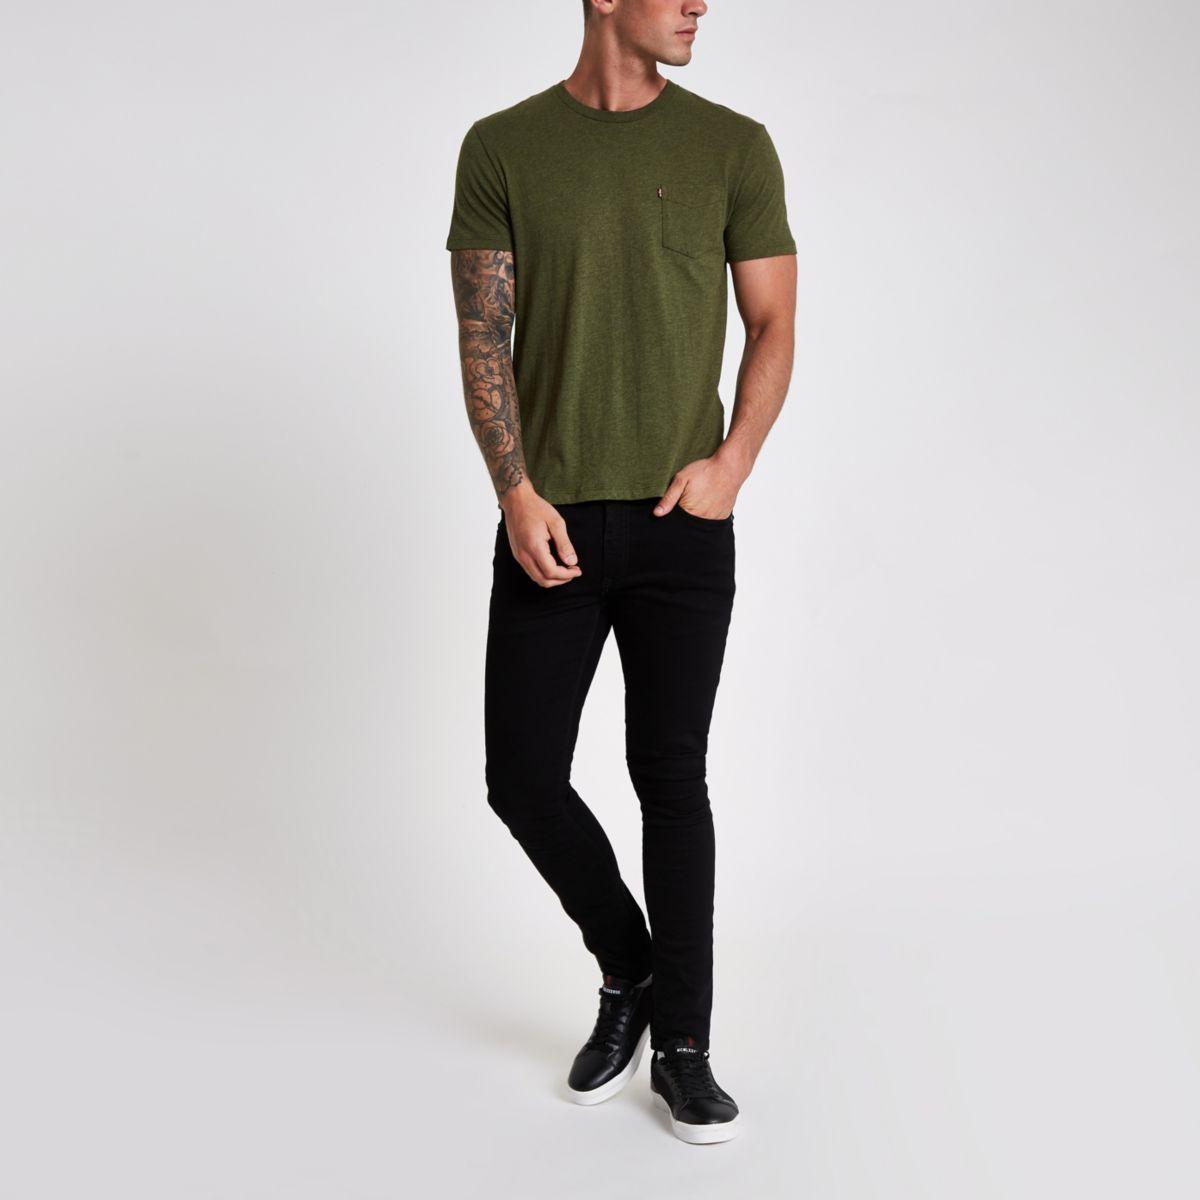 short khaki pocket T sleeve shirt Levi's wZqpd5q